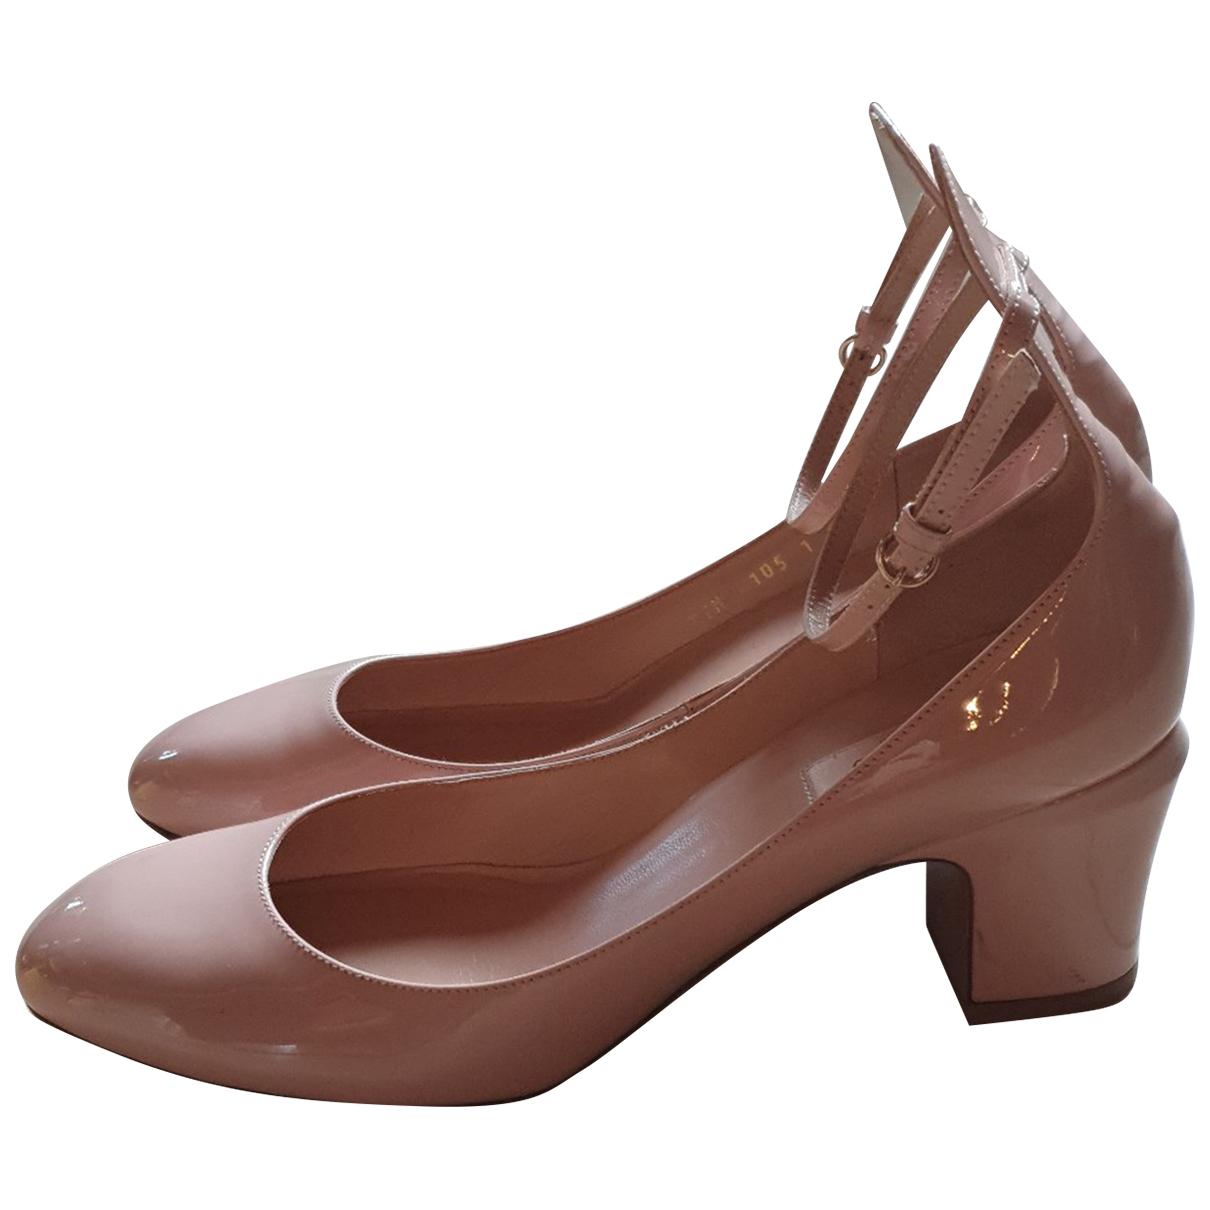 Valentino Garavani Tango Pink Patent leather Heels for Women 41 IT